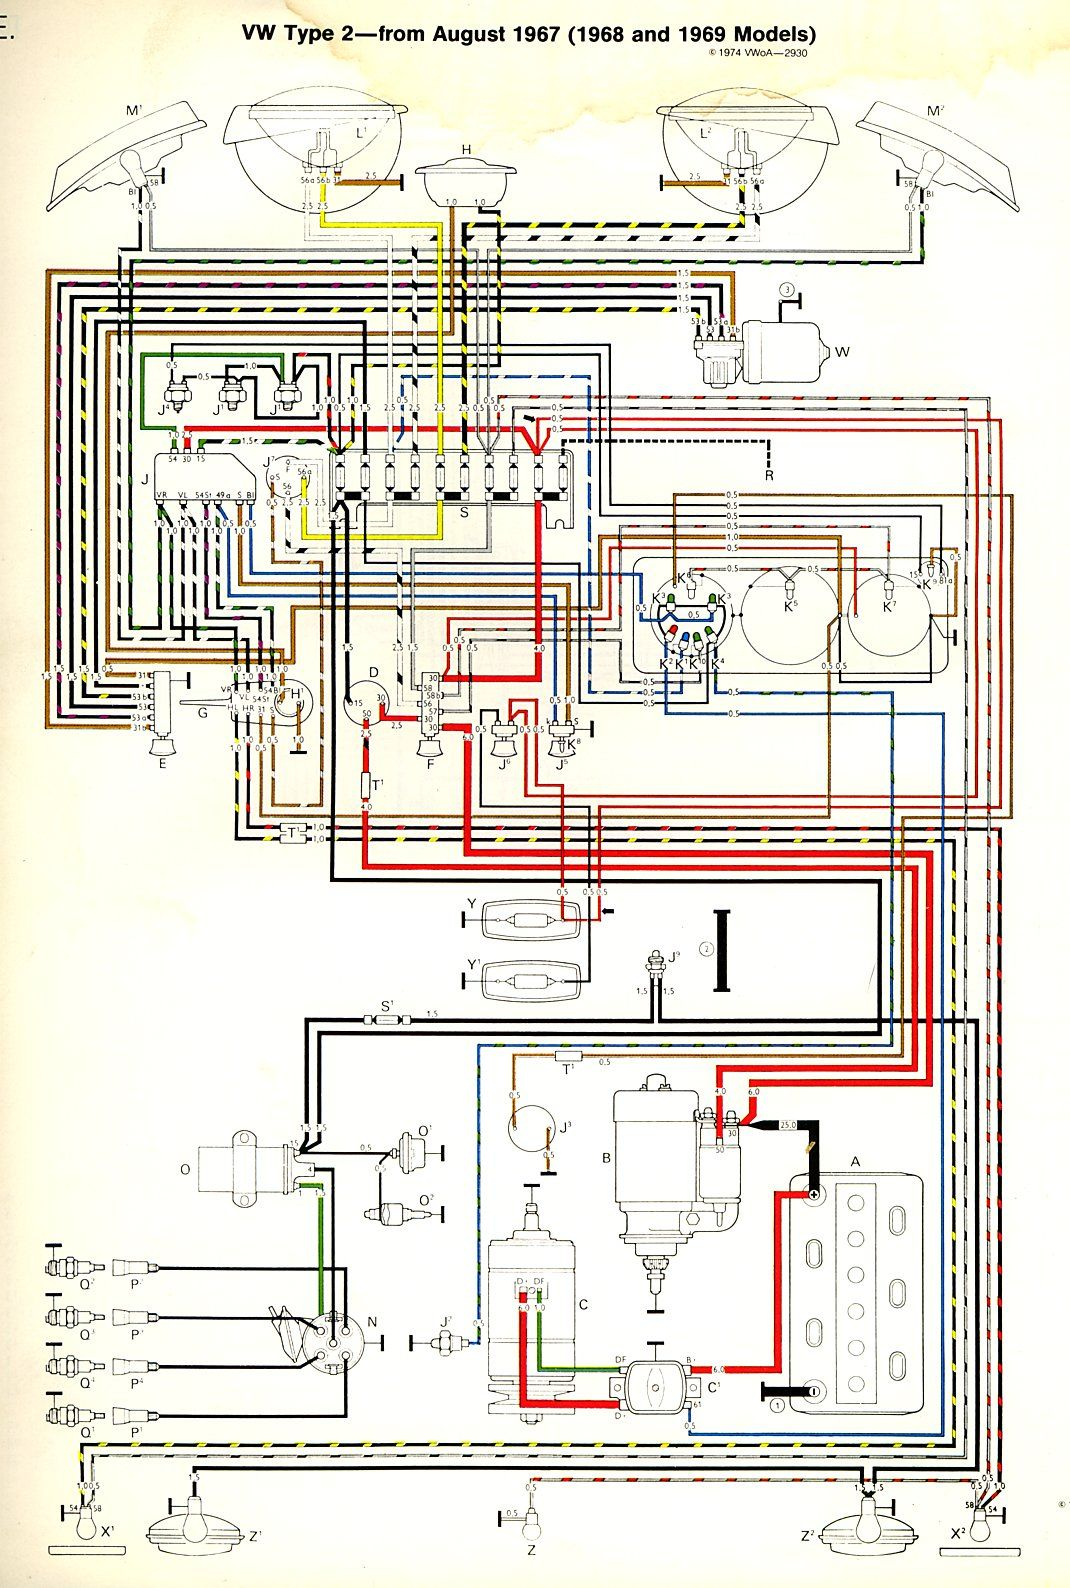 engine diagram 1974 vw bus camper [ 1070 x 1588 Pixel ]